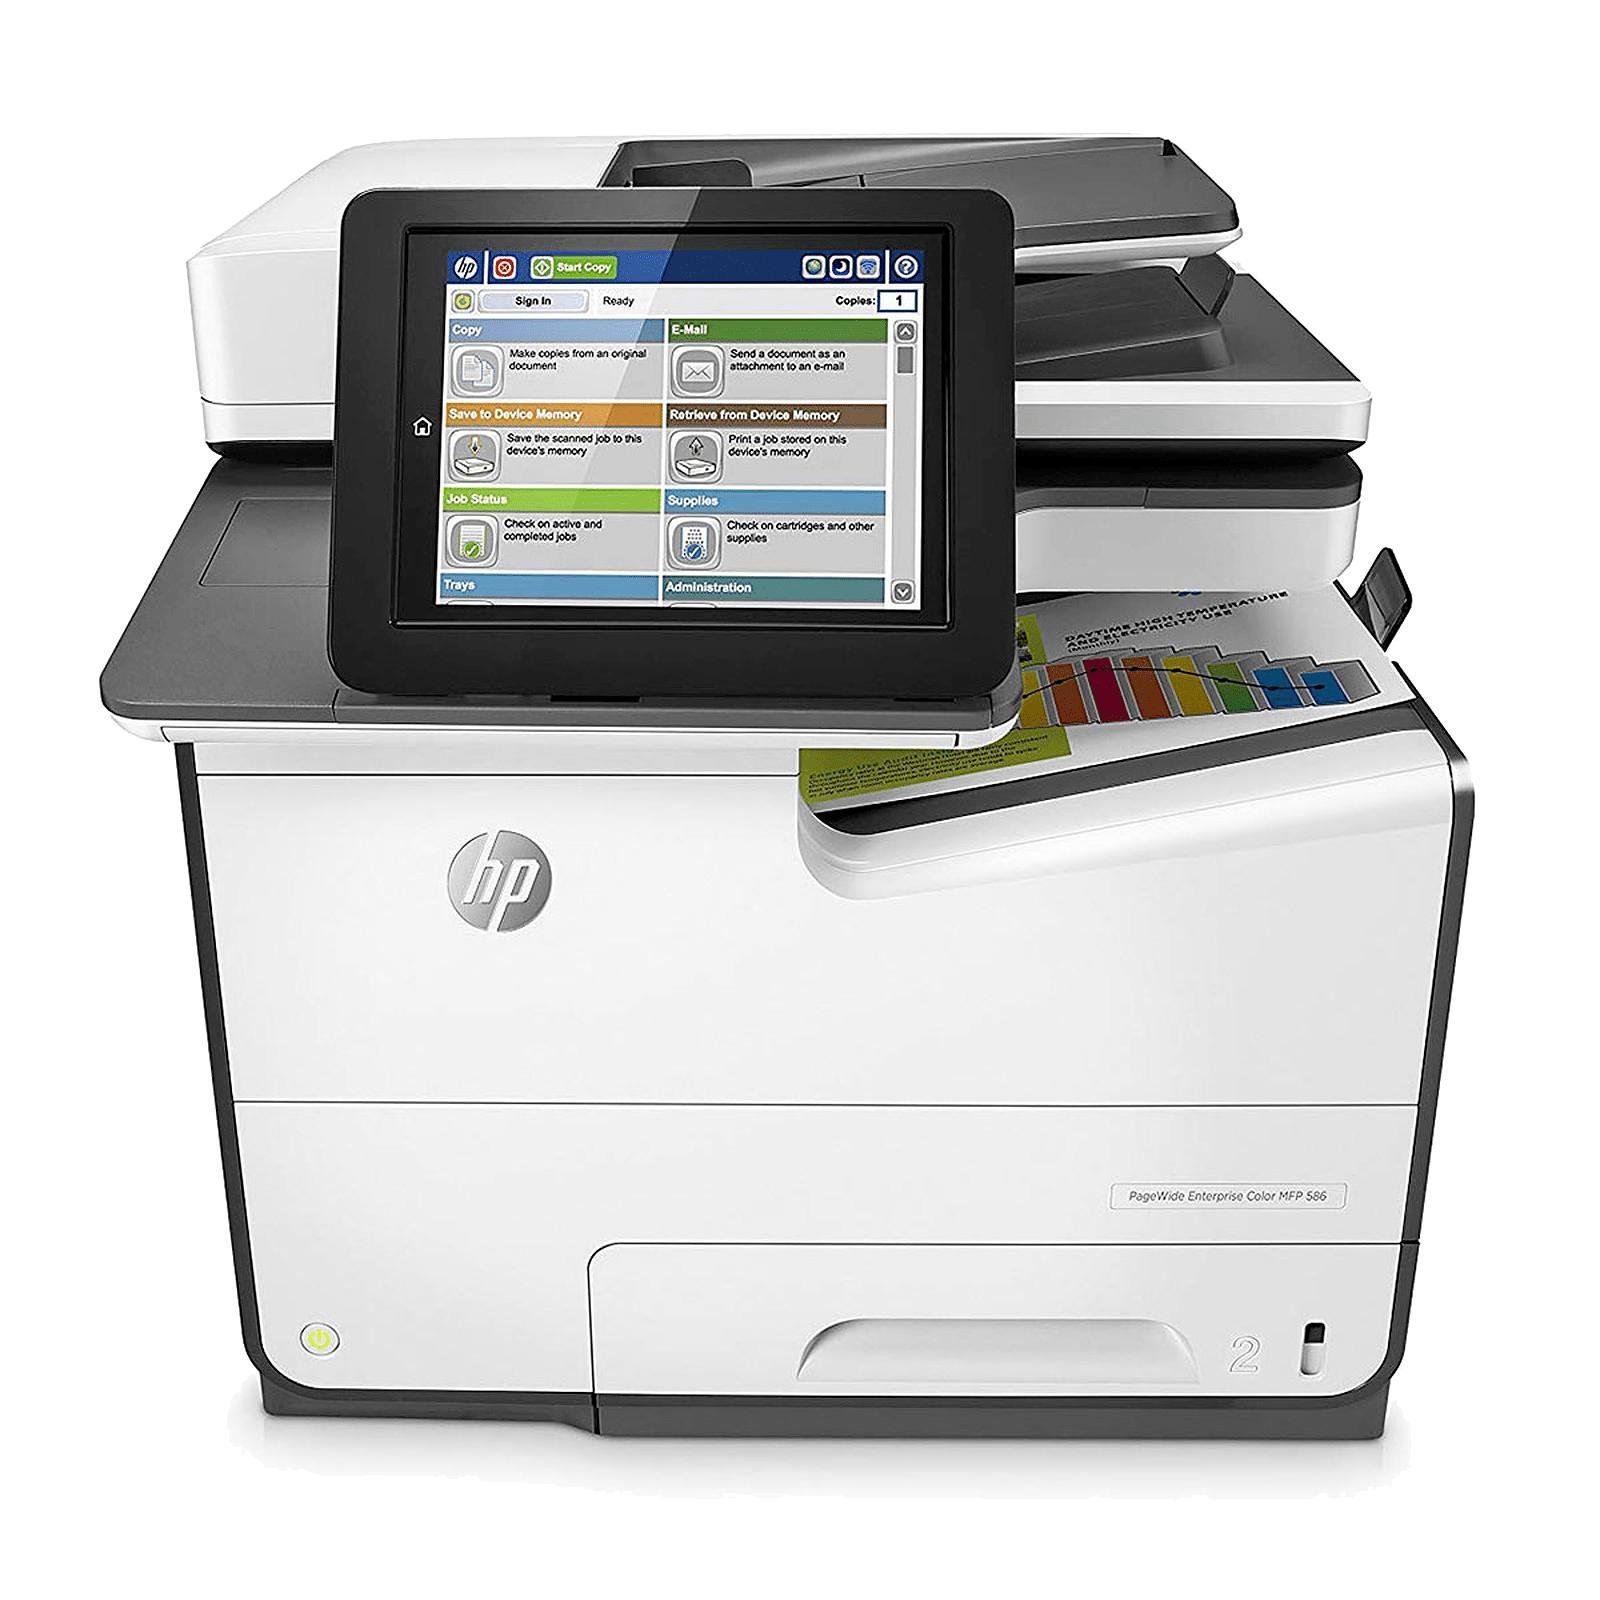 Impresora Hp PageWide